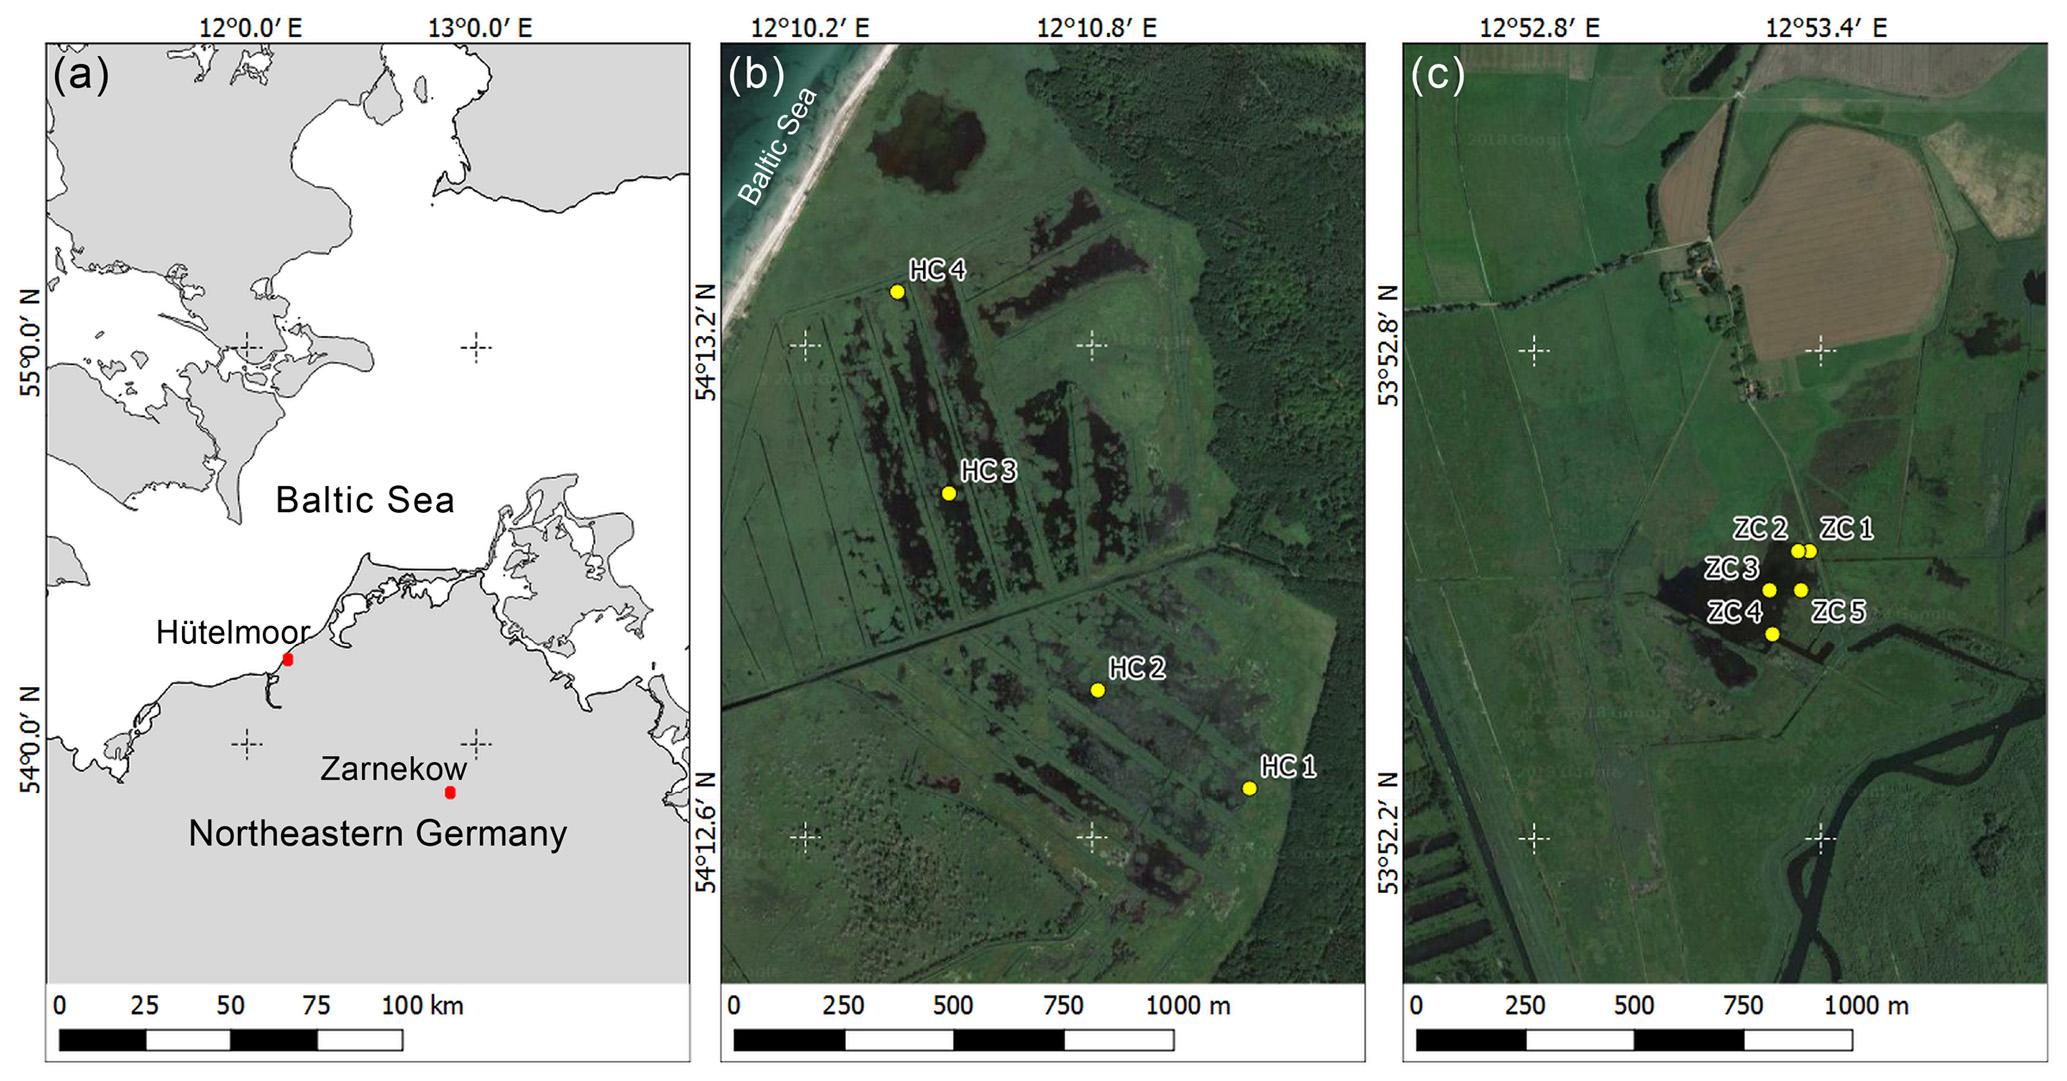 BG - Predominance of methanogens over methanotrophs in rewetted fens